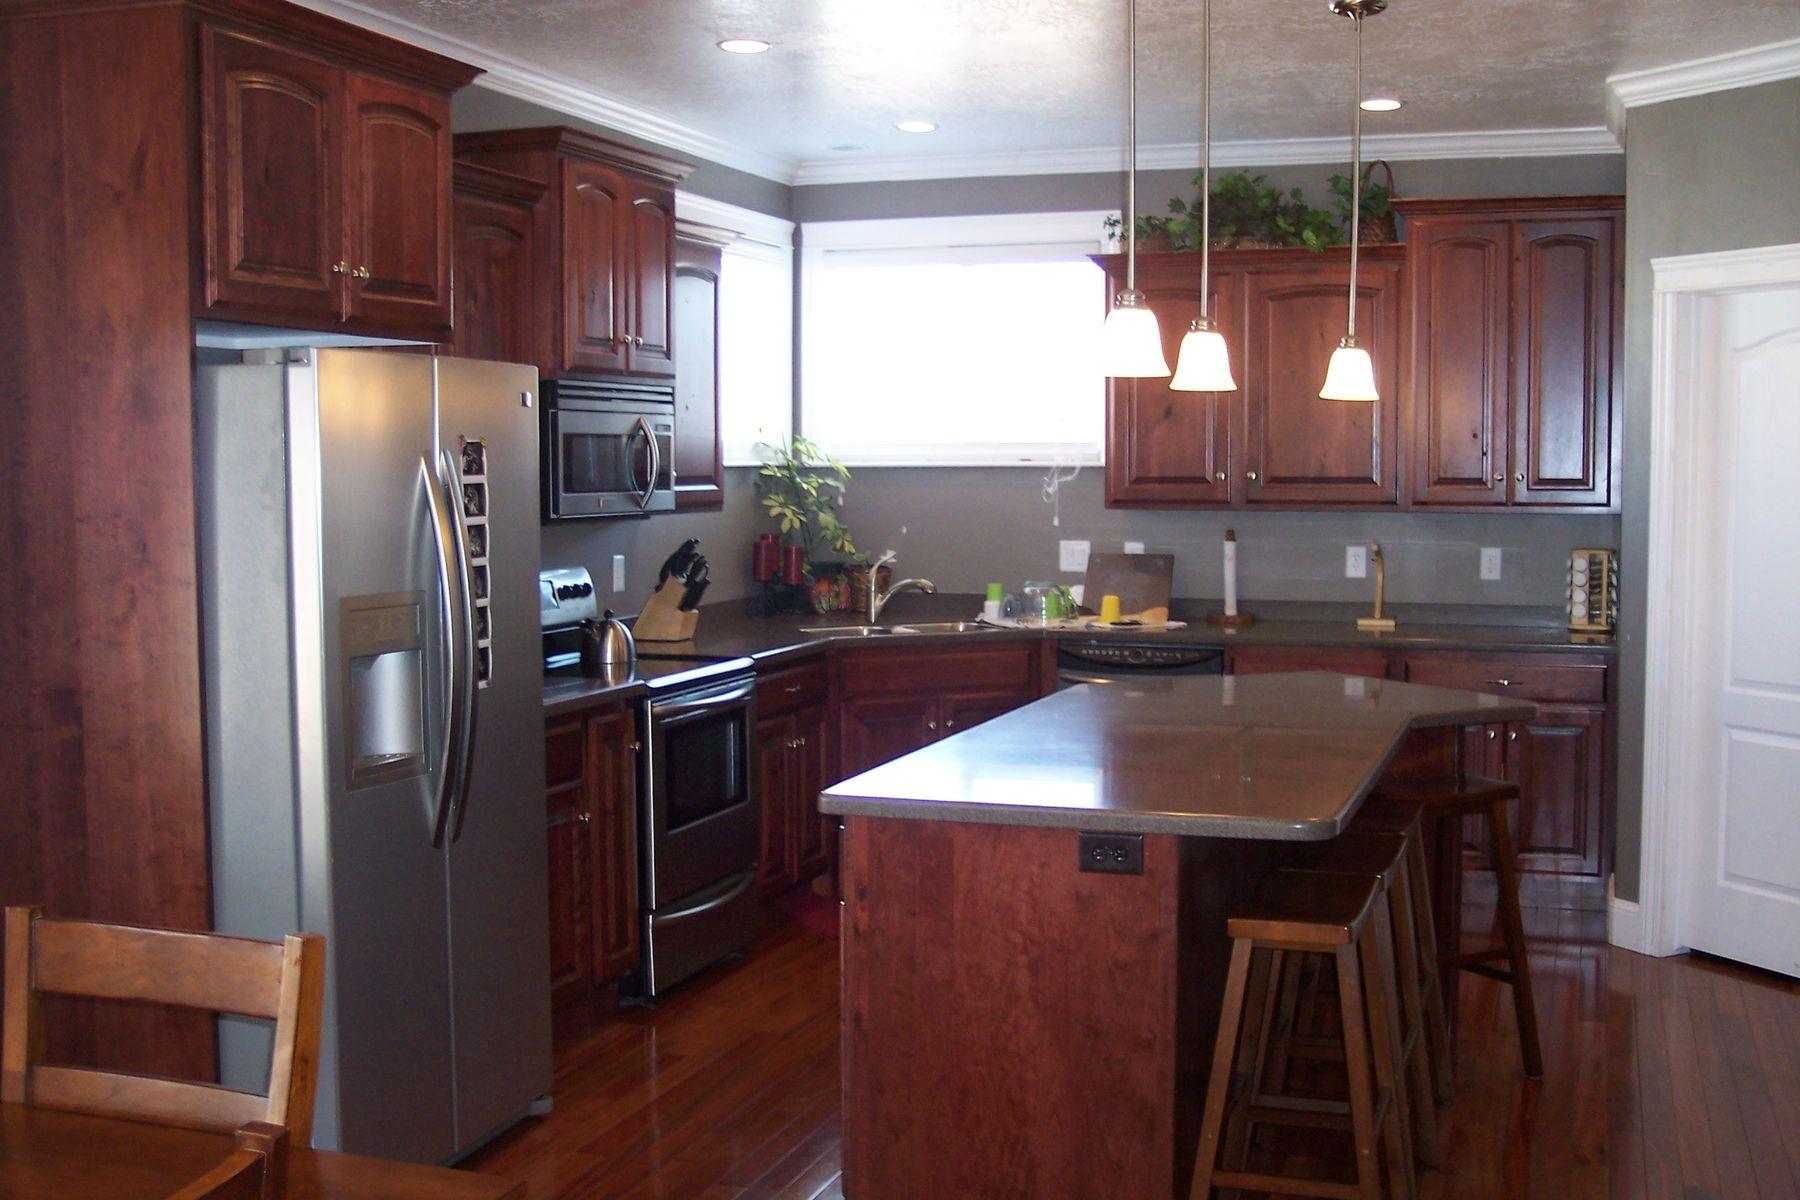 Custom Kitchen Cabinets | Cherry wood kitchen cabinets ...